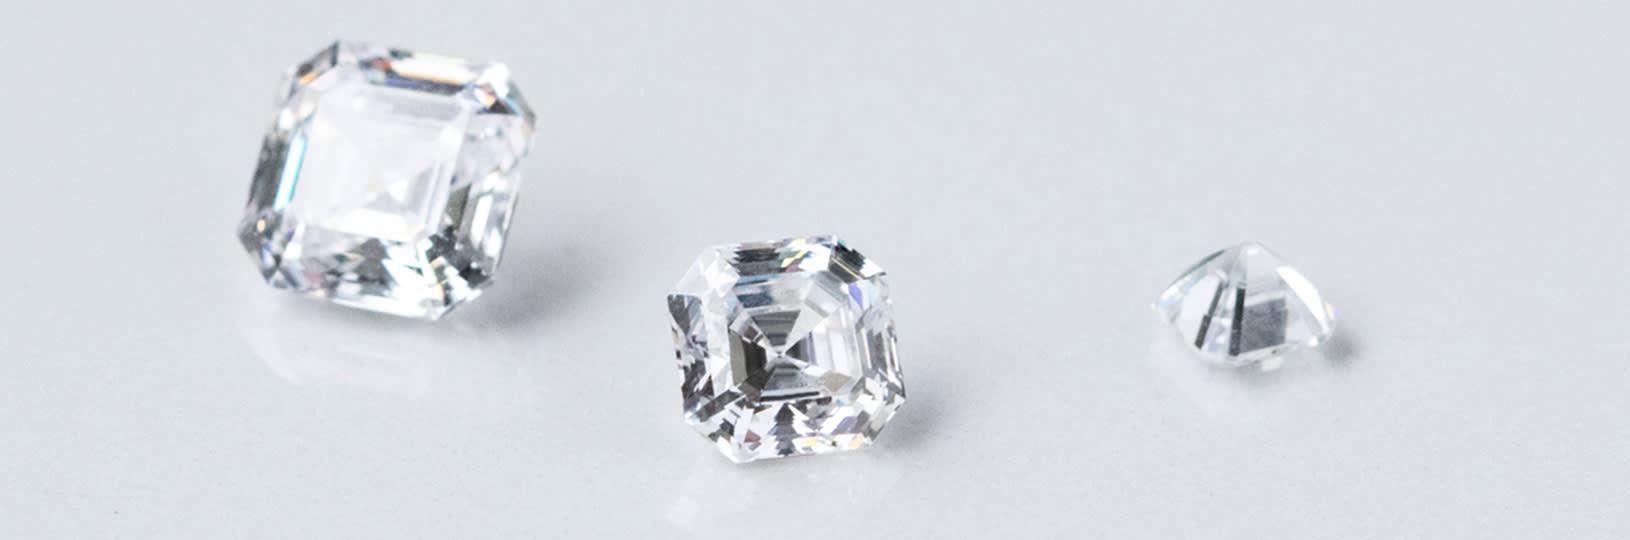 A close up image of three diamond simulants